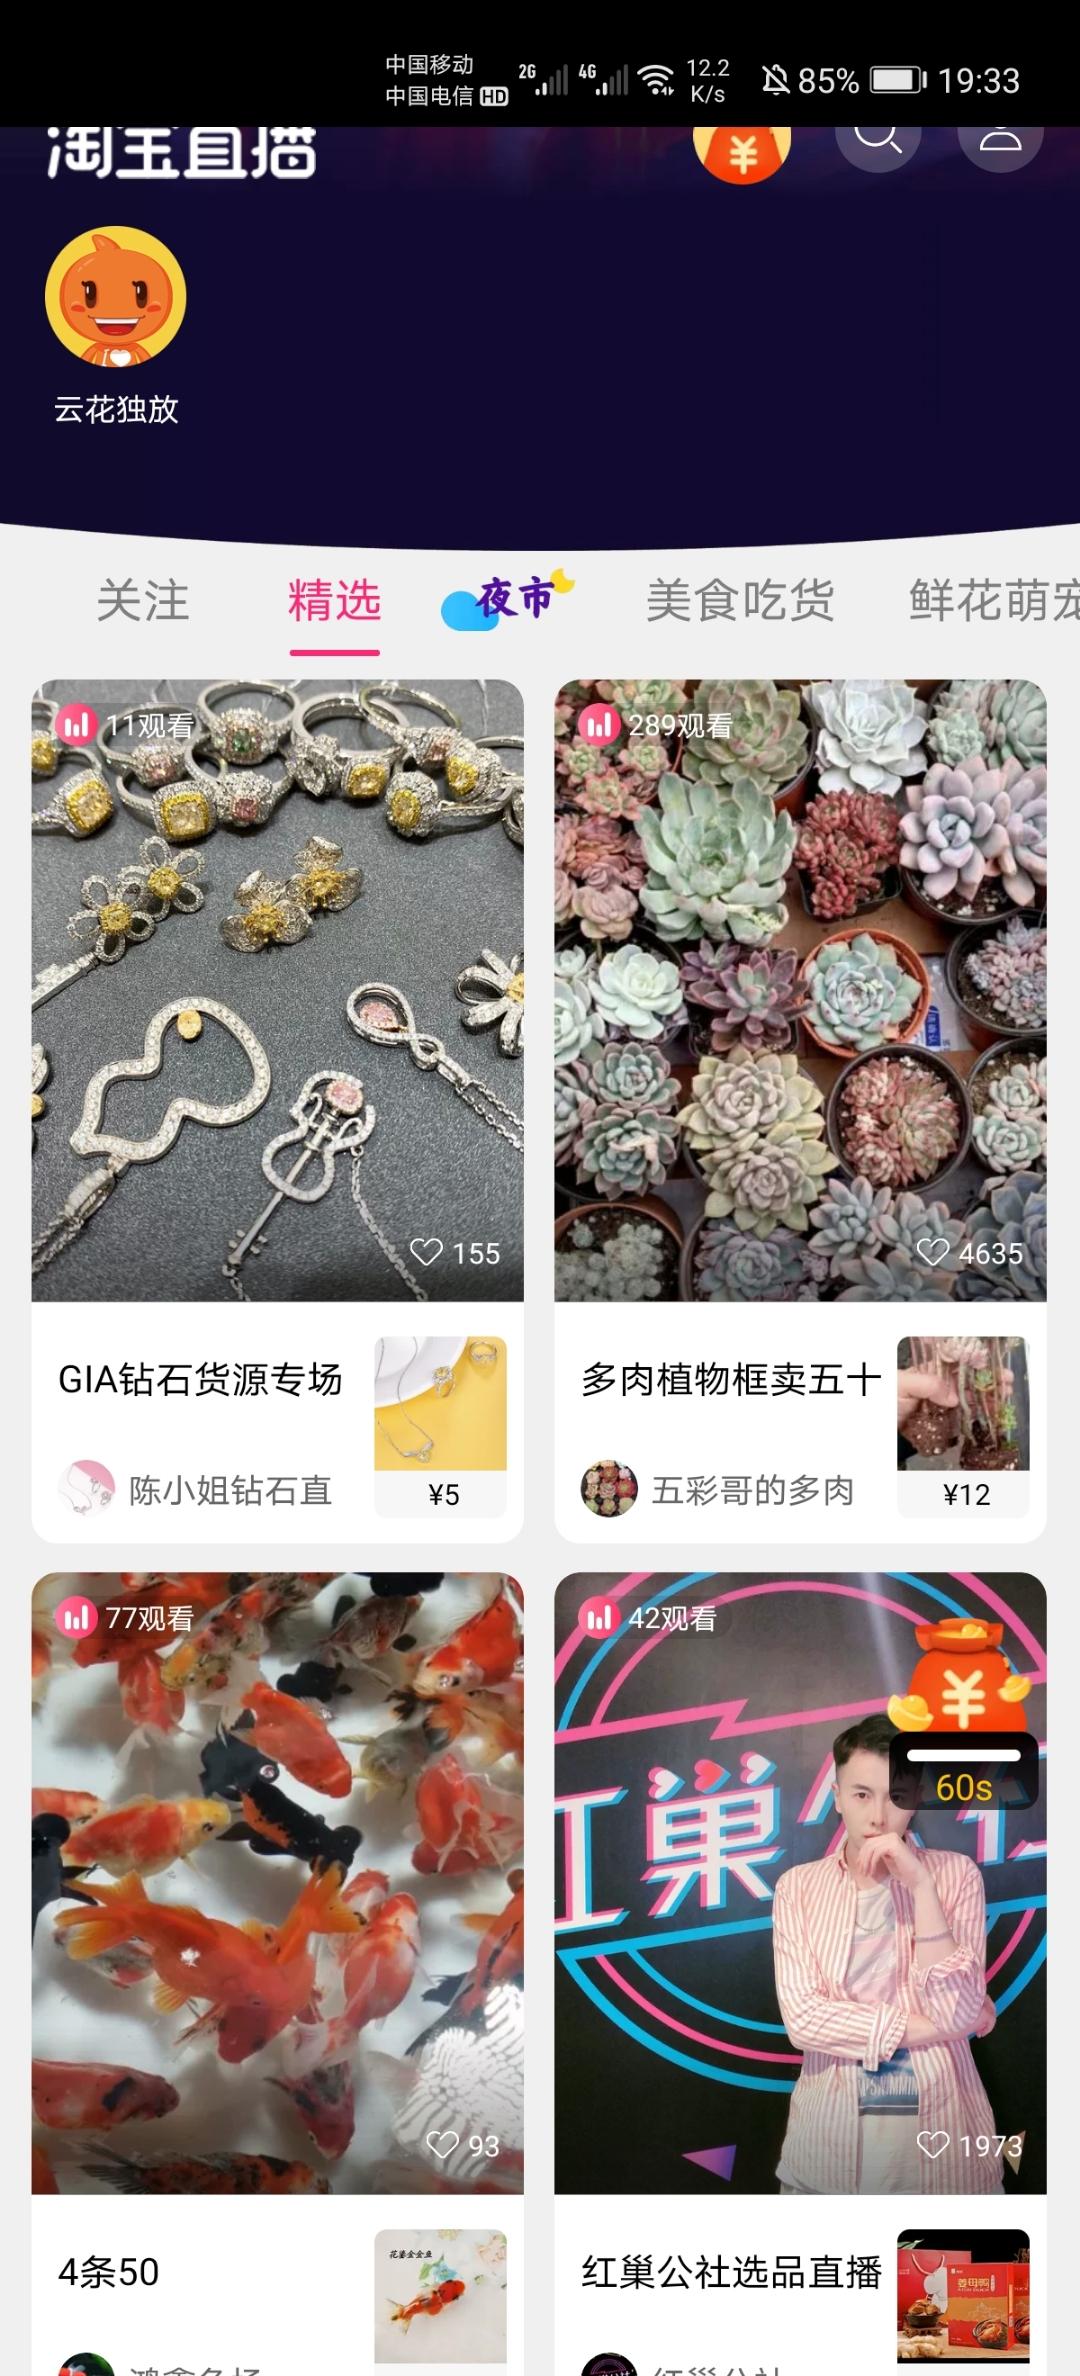 Screenshot_20200508_193322_com.taobao.live.jpg